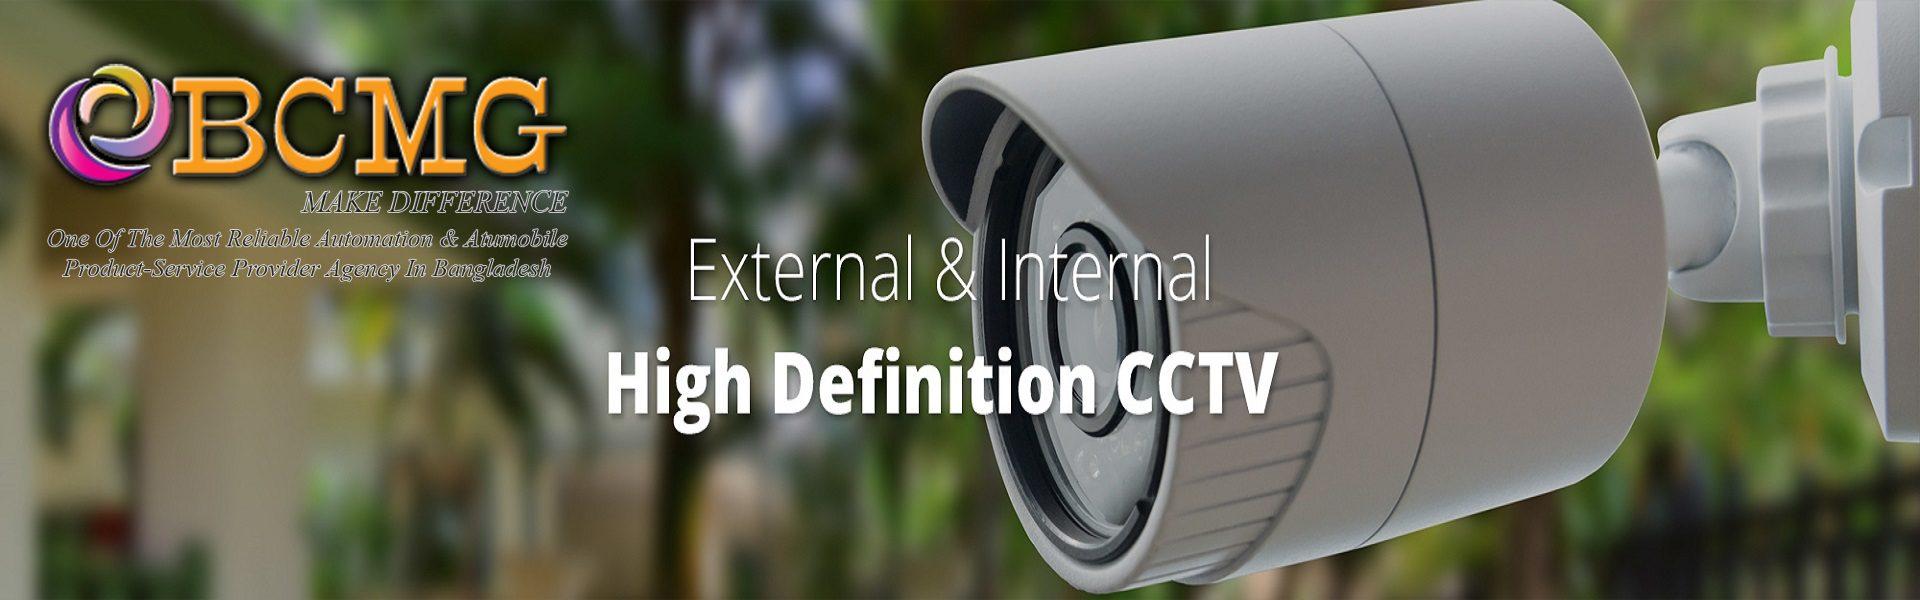 cc tv camera